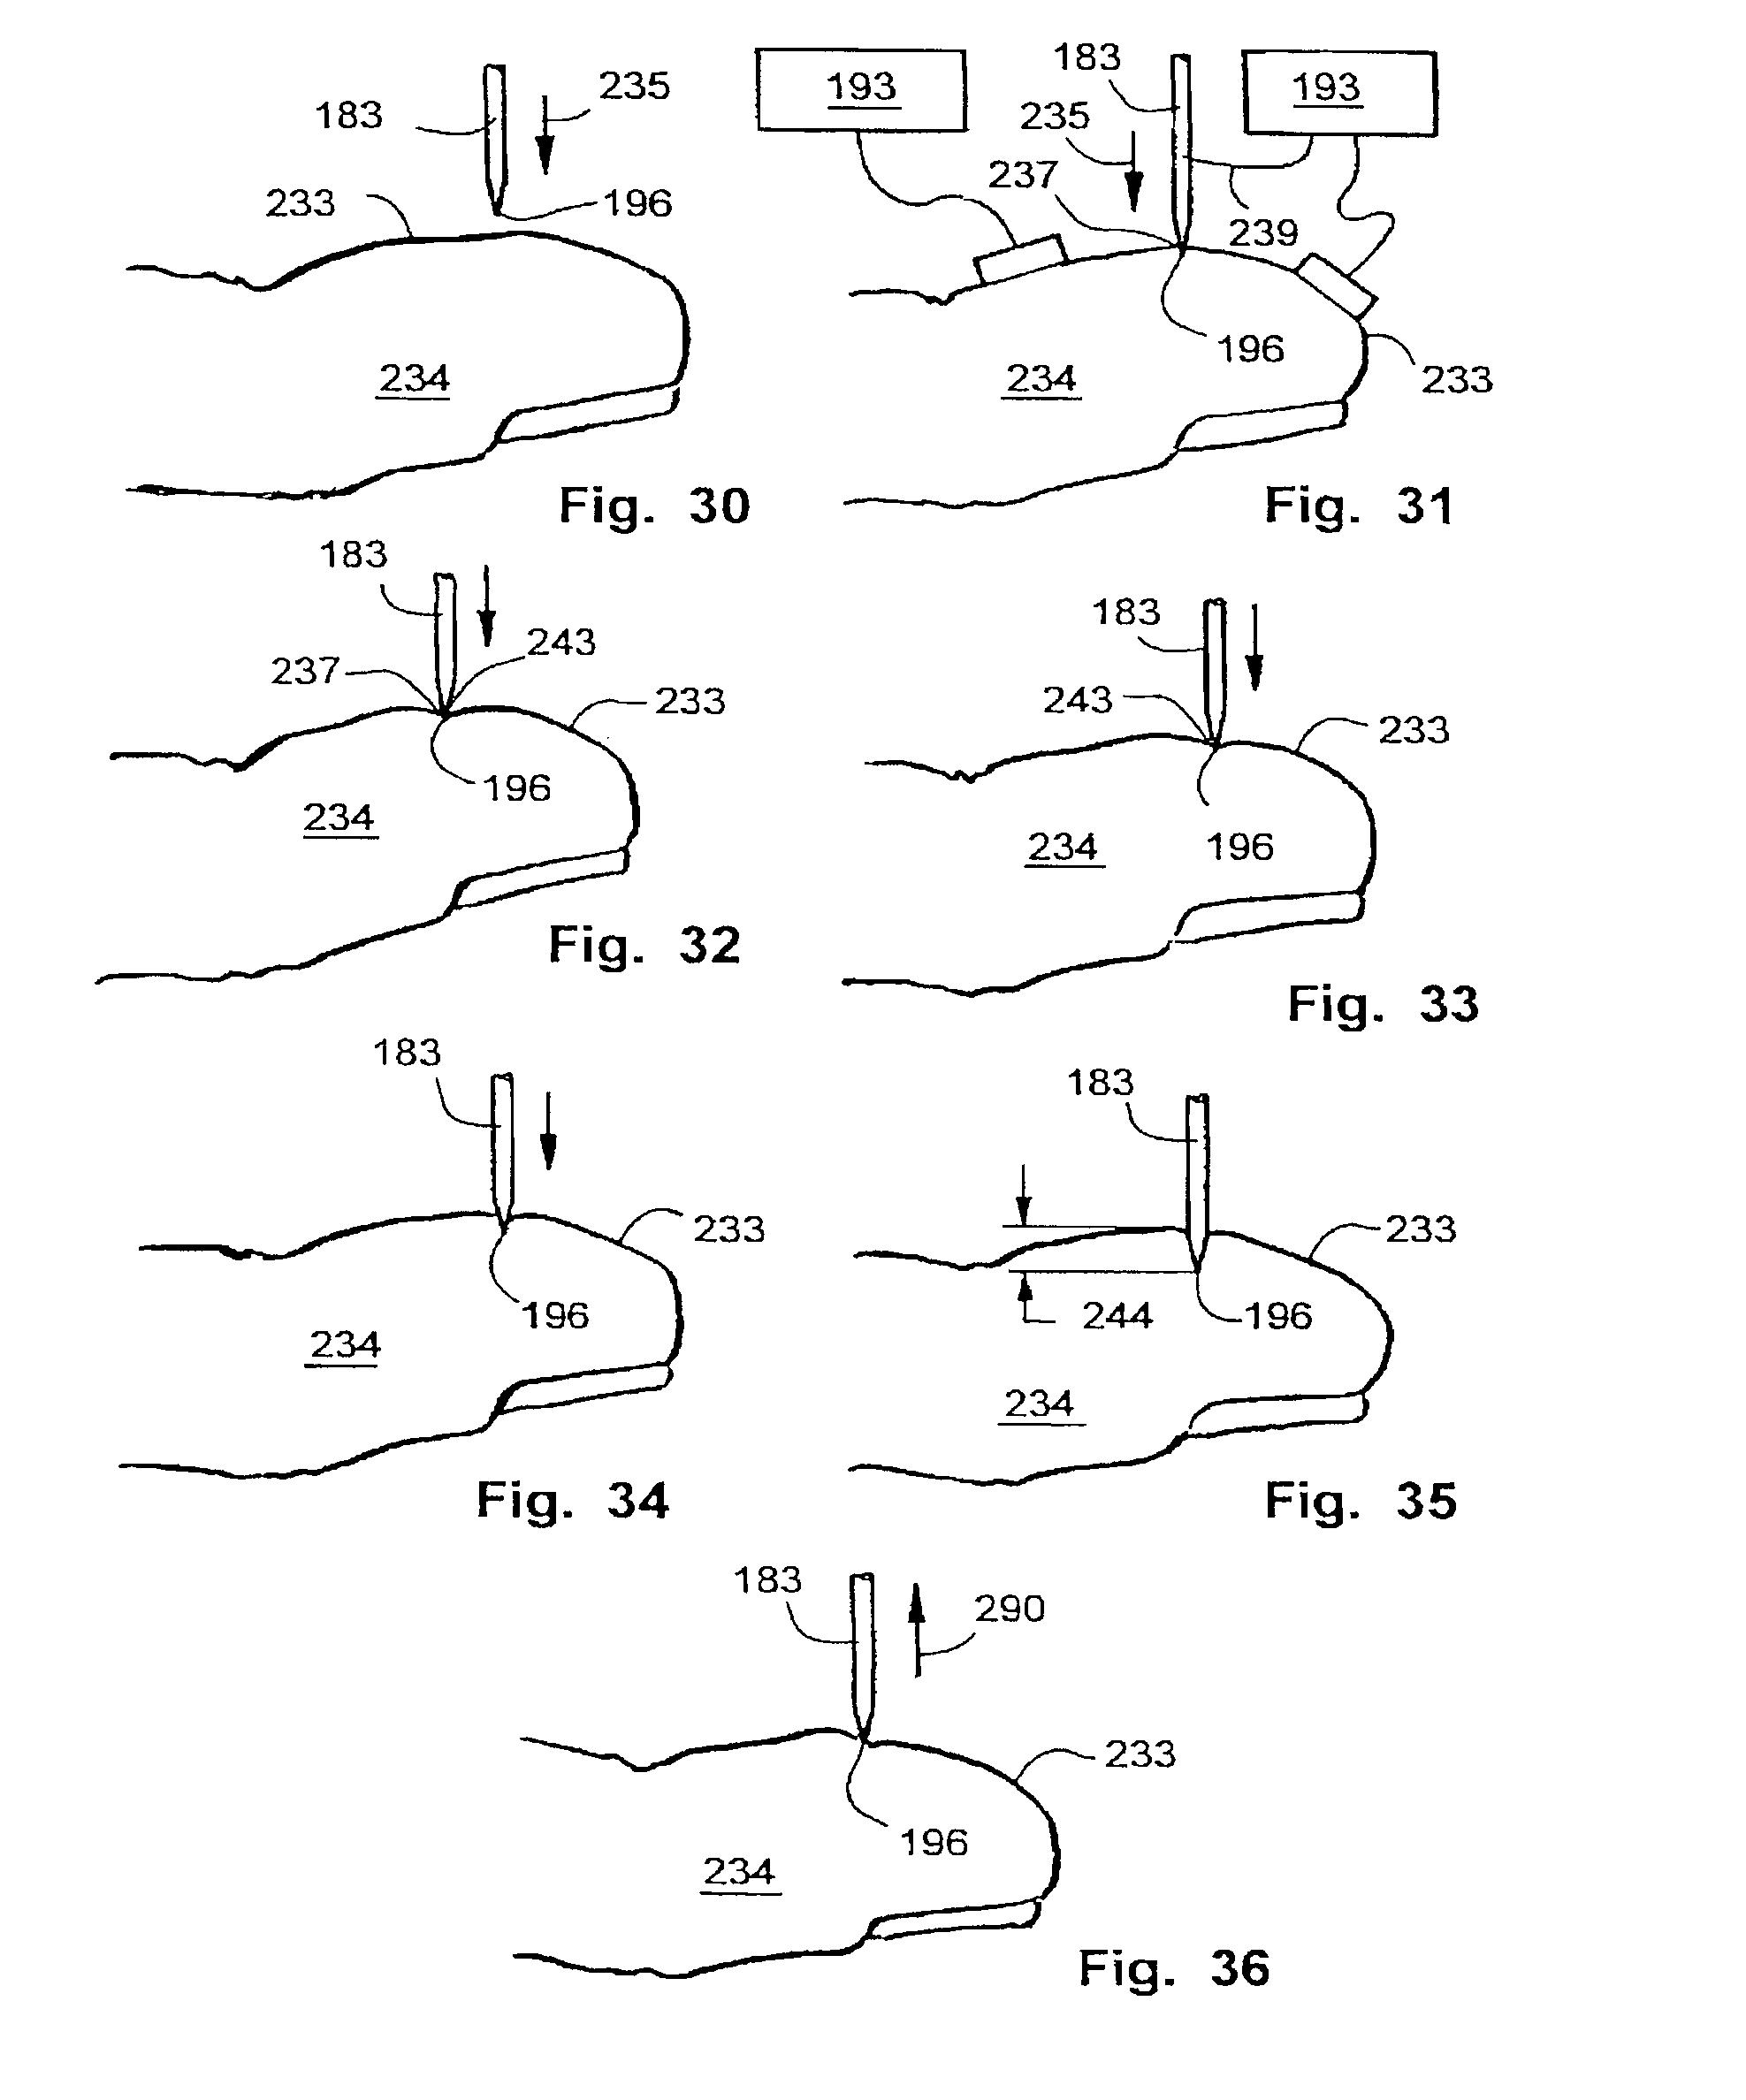 US B2 Tissue penetration device Google Patents